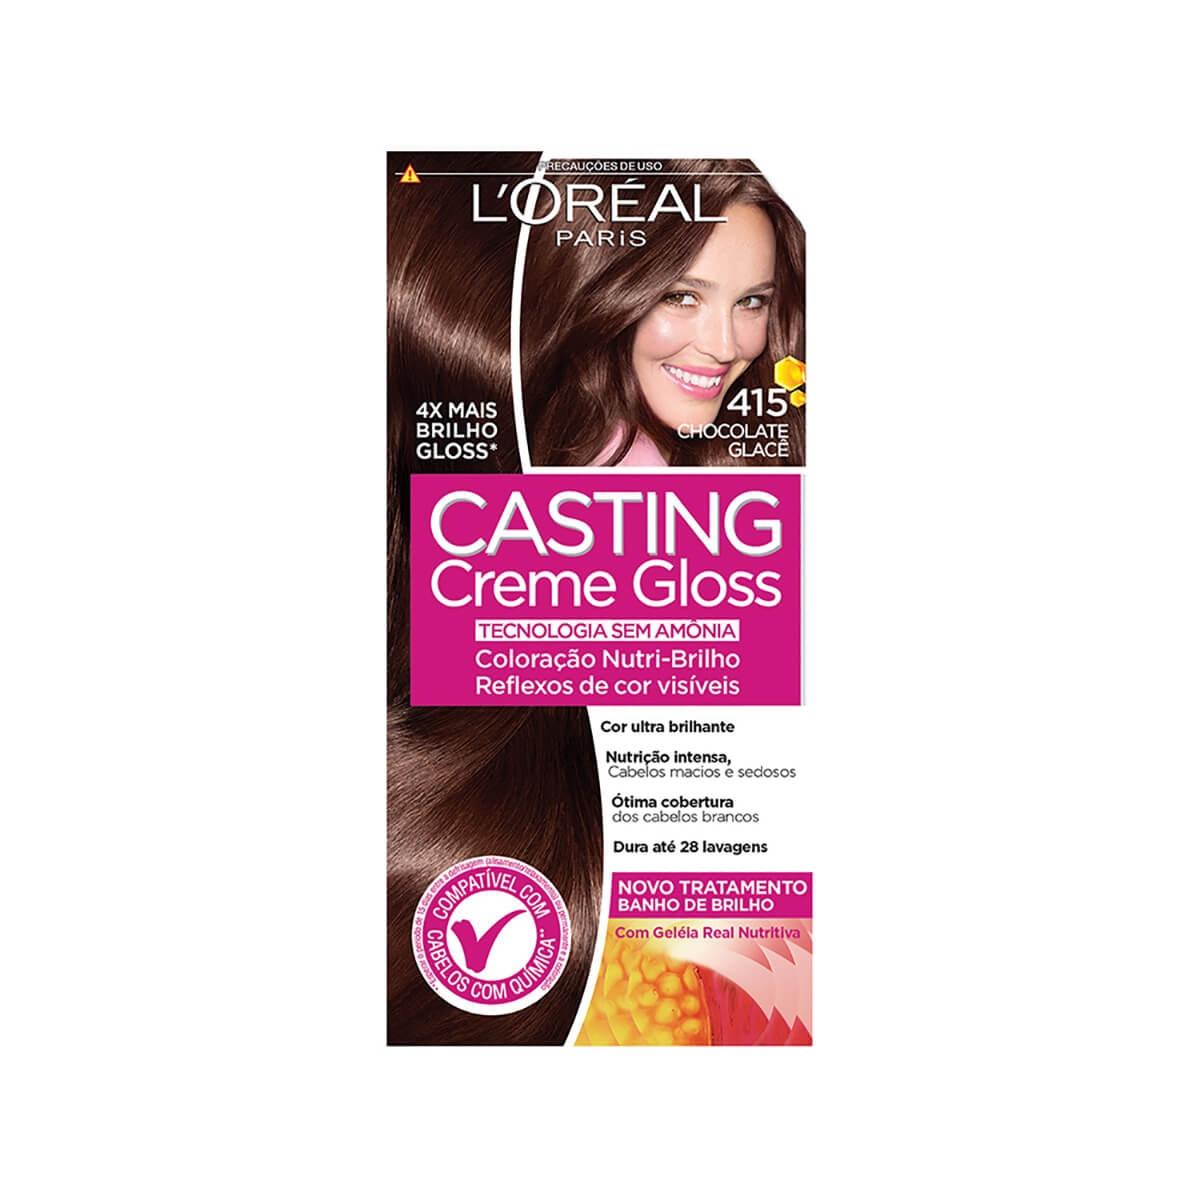 Tintura Semi-Permanente Casting Creme Gloss 415 Chocolate Glacê L'Oréal 1 Unidade